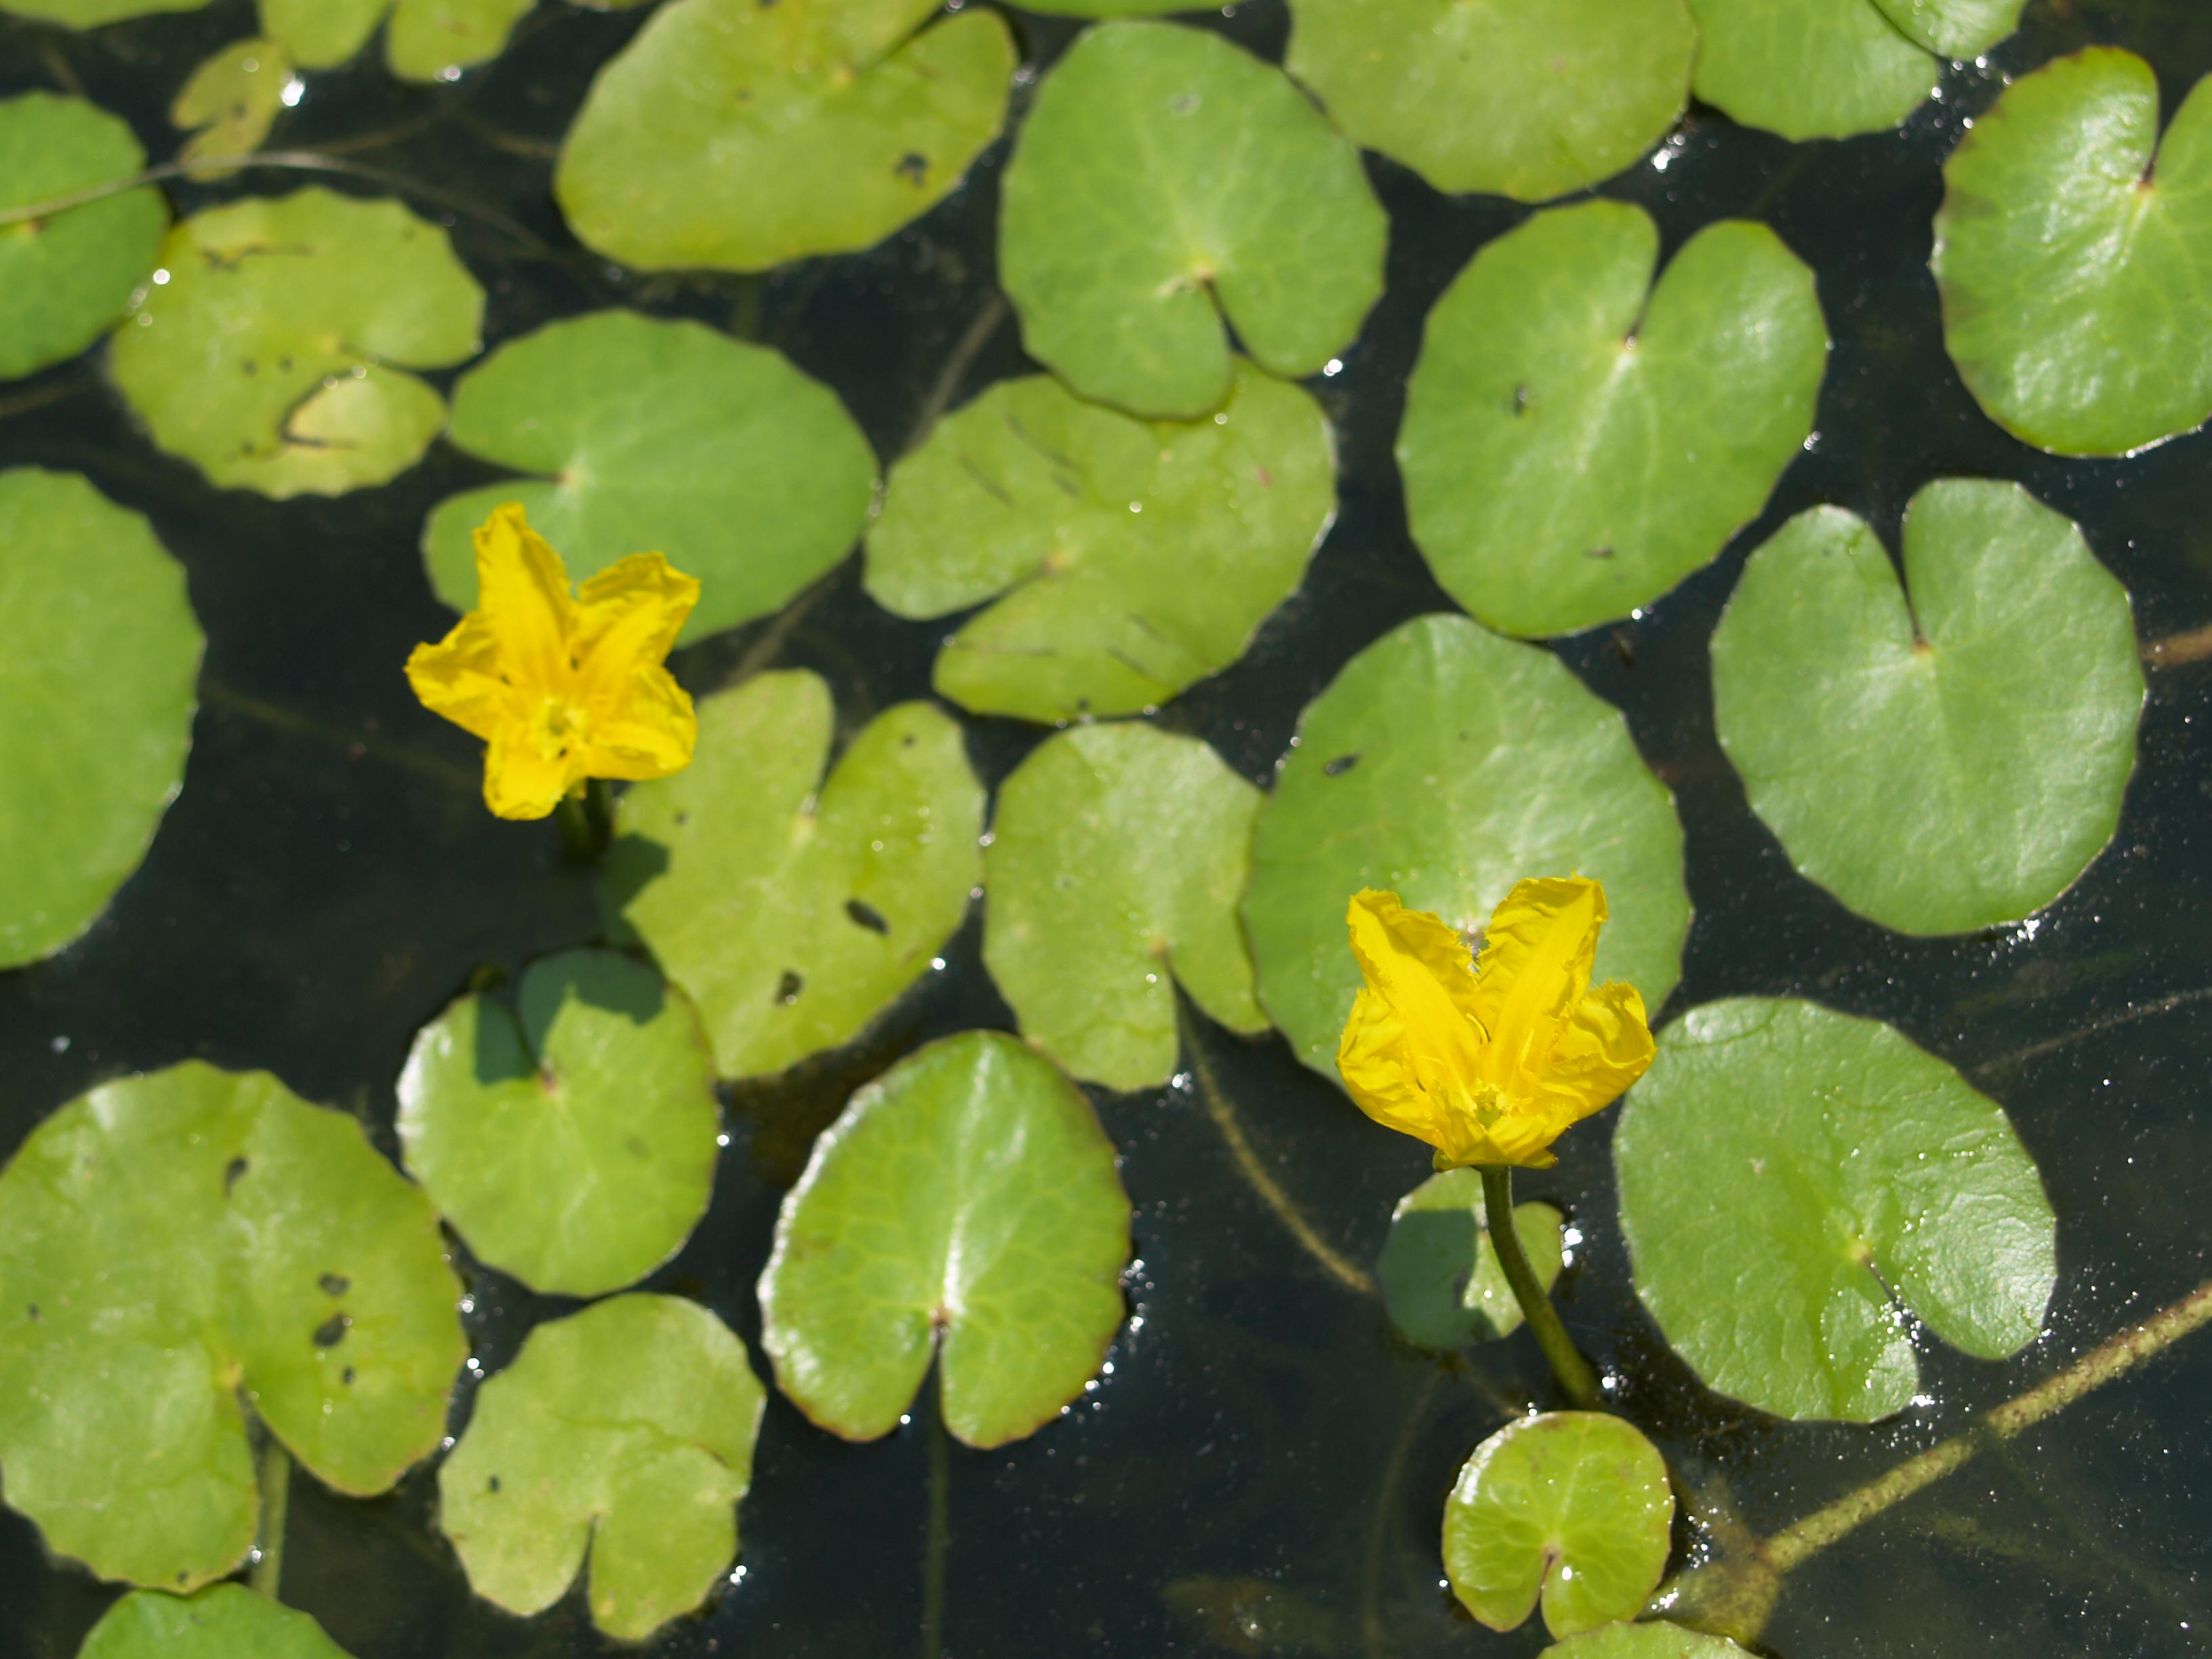 Plants in the water gardens ramblin 39 through dave 39 s garden for Best aquatic plants